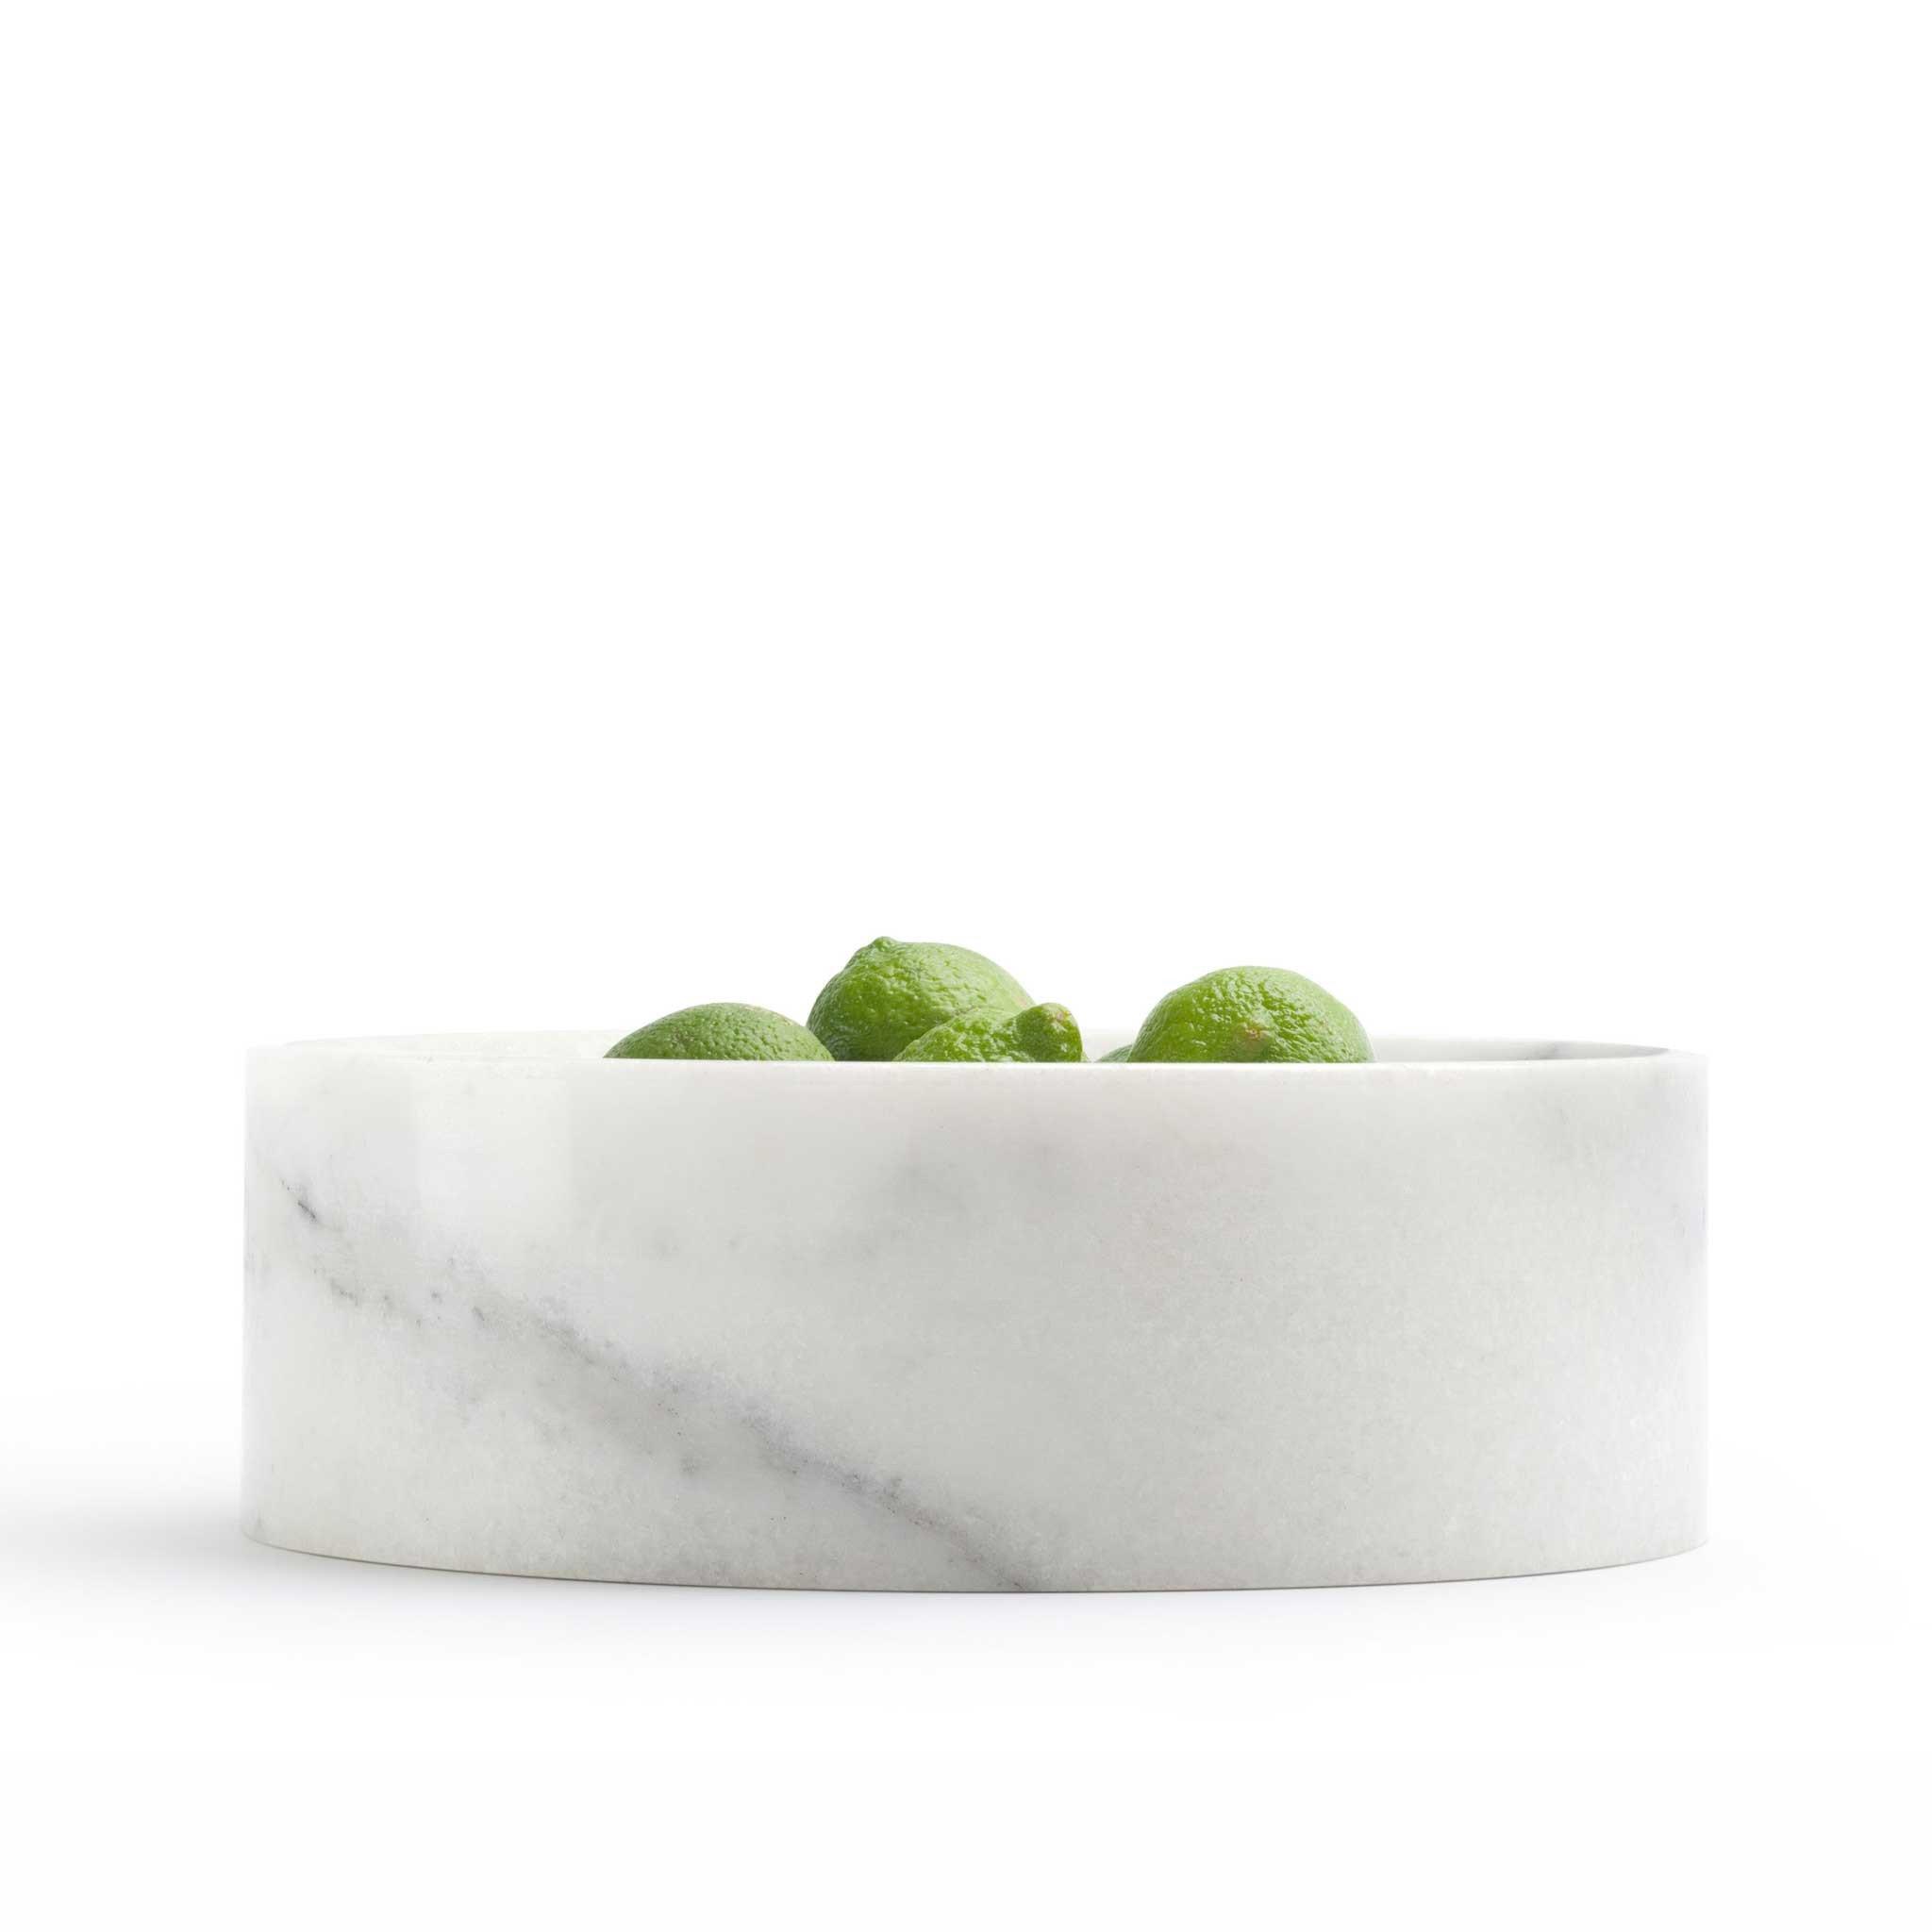 M.VERHEYDEN--coupe-marblelemon.hs.jpg